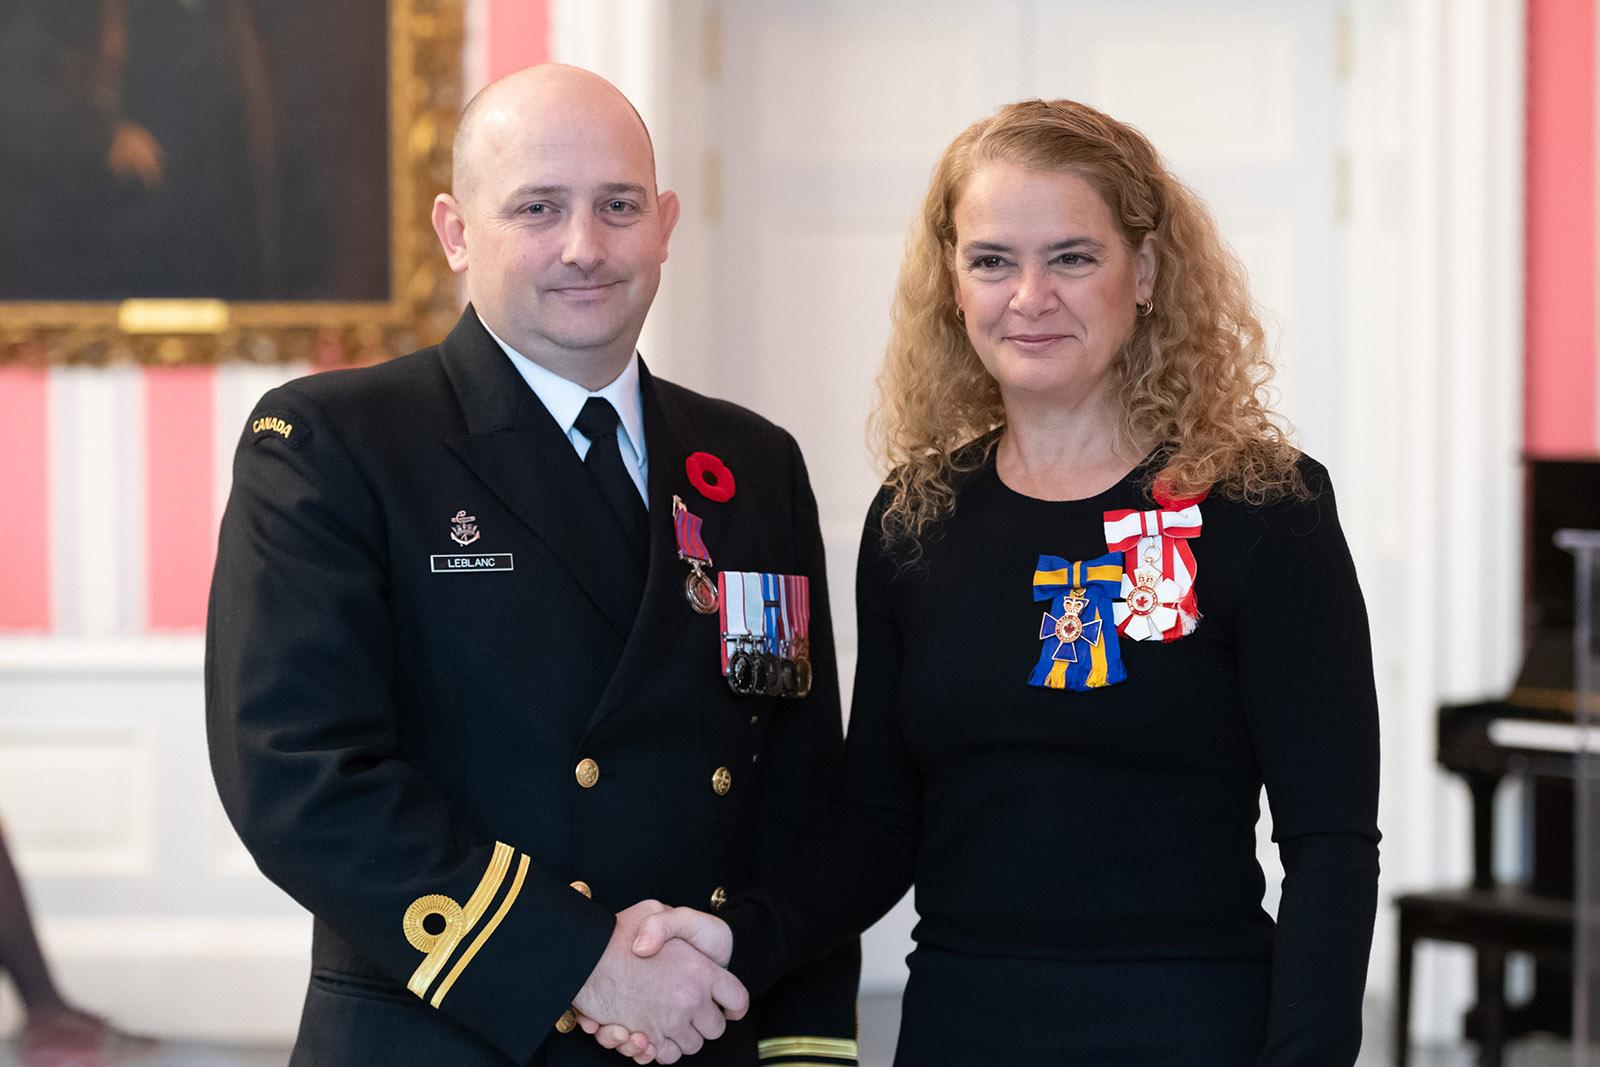 Sub-Lieutenant David LeBlanc received the Medal of Bravery on November 5th, 2018 at Rideau Hall in Ottawa.